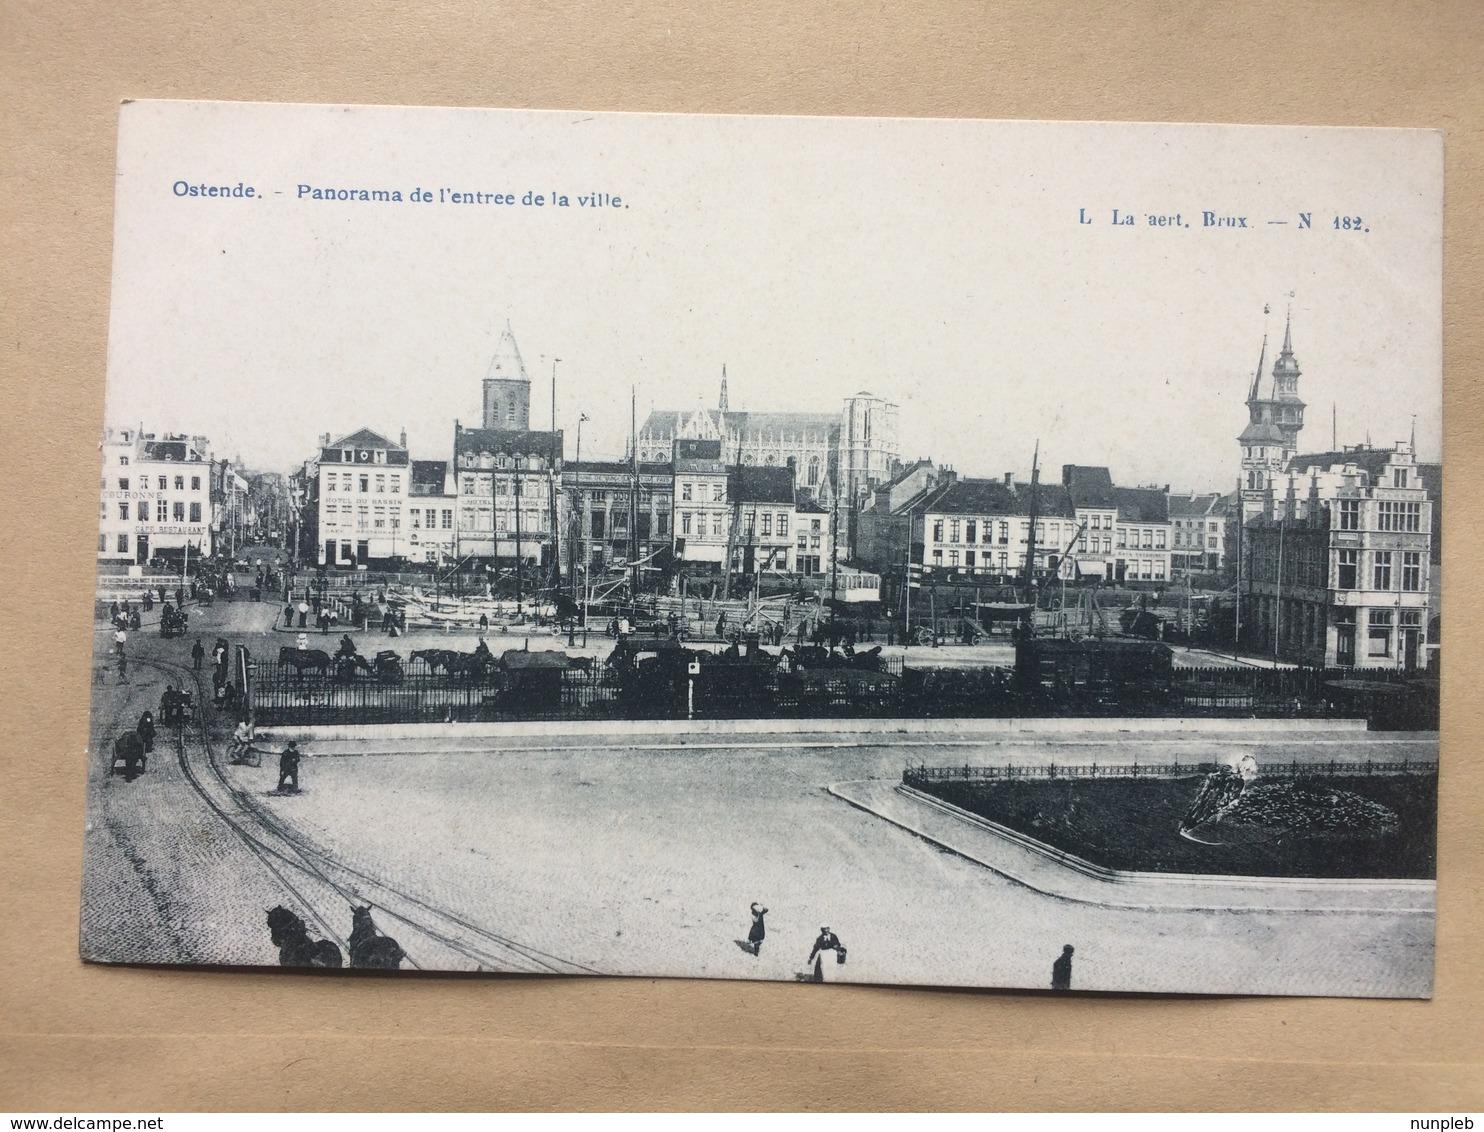 BELGIUM - Oostende Ostend - Panorama De L`entree De La Ville - La Aert Brux N.182 - Oostende